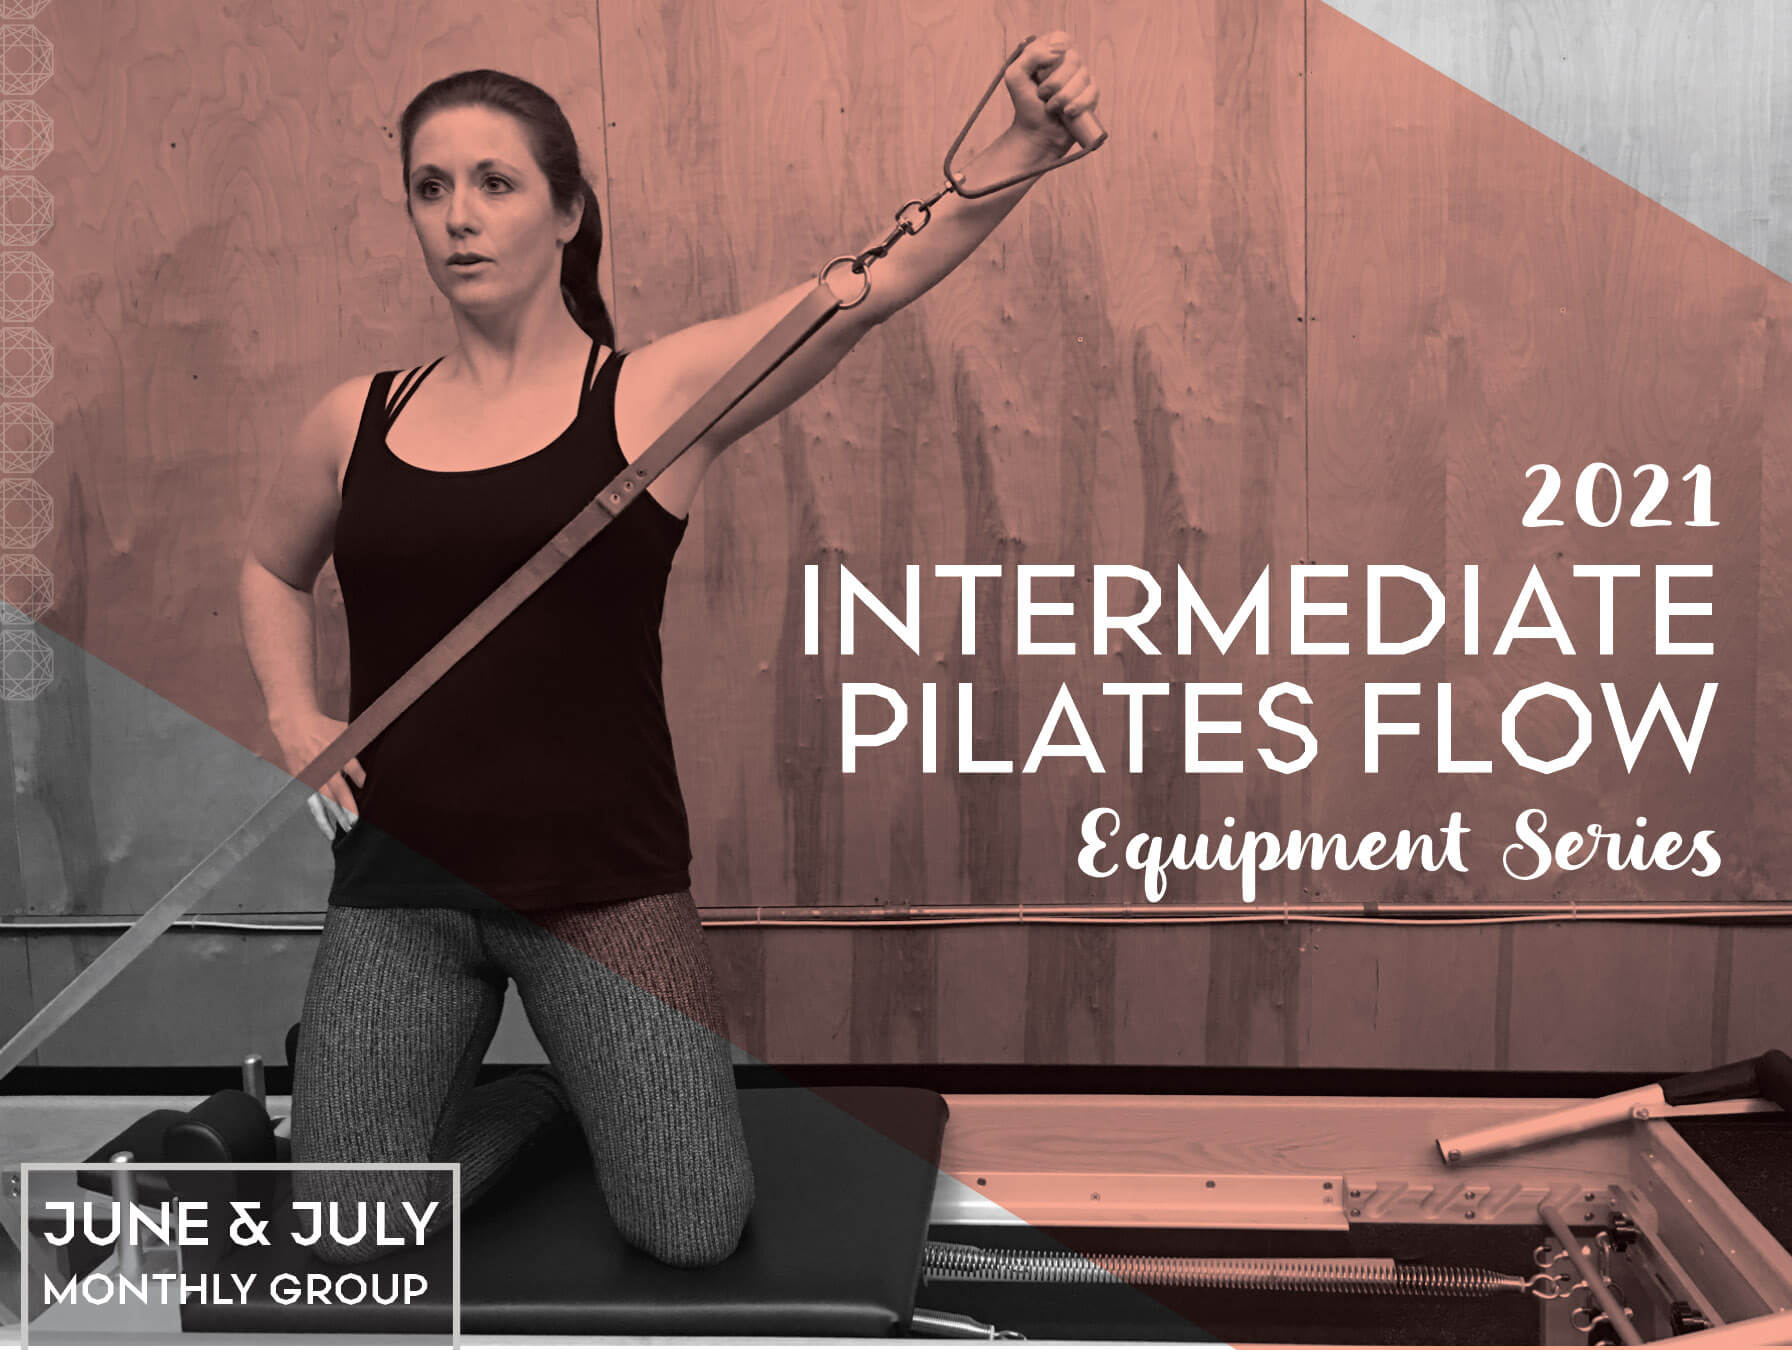 Intermediate Pilates Flow: Equipment Series